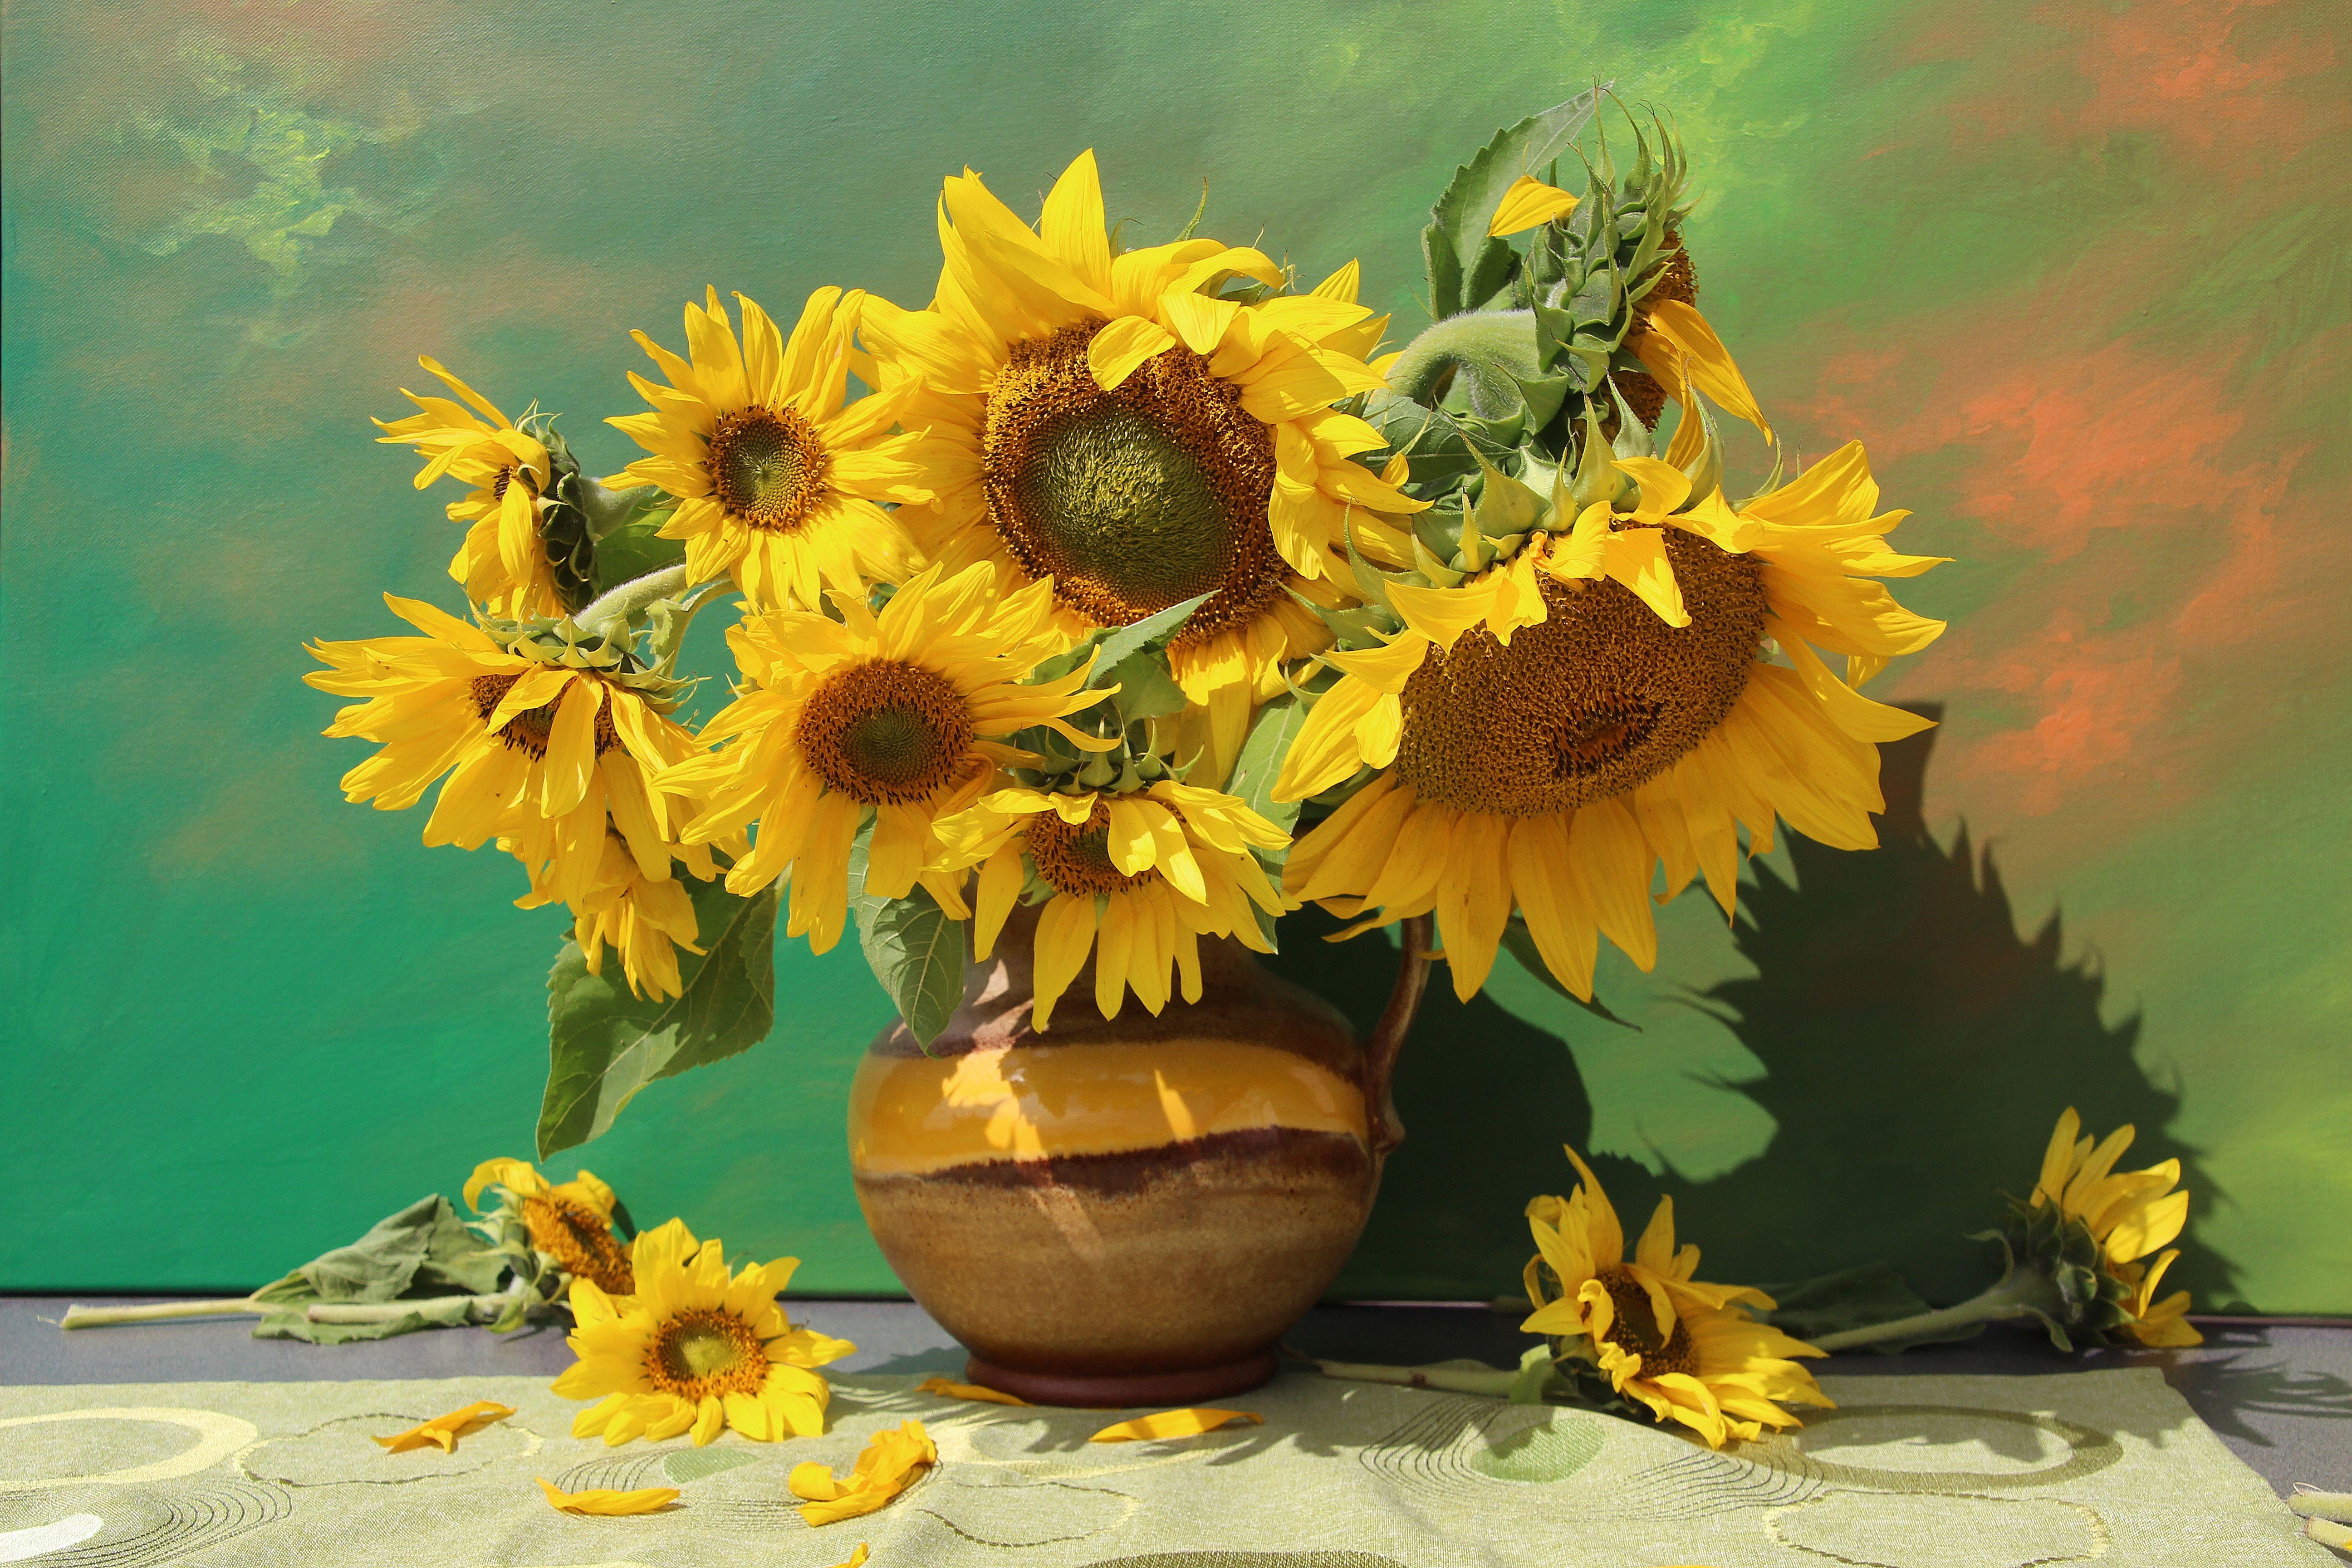 Vintage Blooming Roses Design Transparent Png Premium Image By Rawpixel Com Flower Illustration Flower Drawing Floral Poster